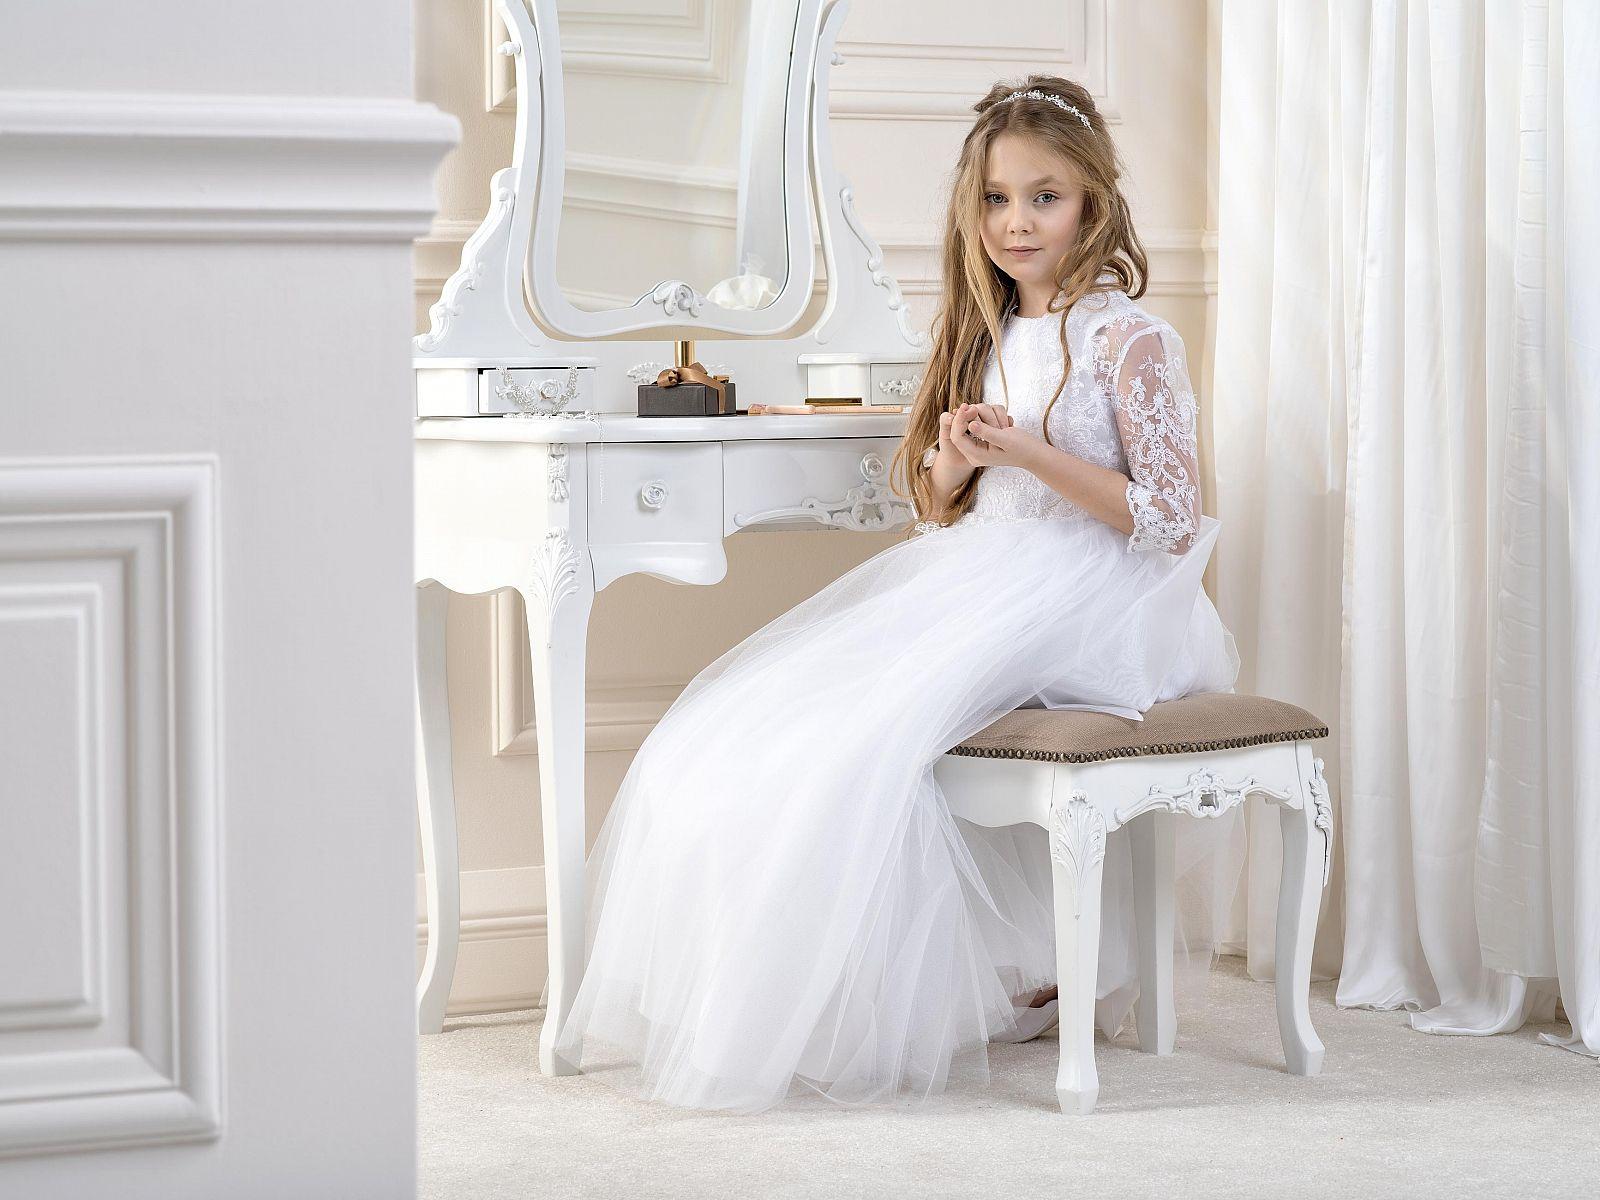 Lace bridesmaid bolero jacket a beautiful lace bolero jacket with